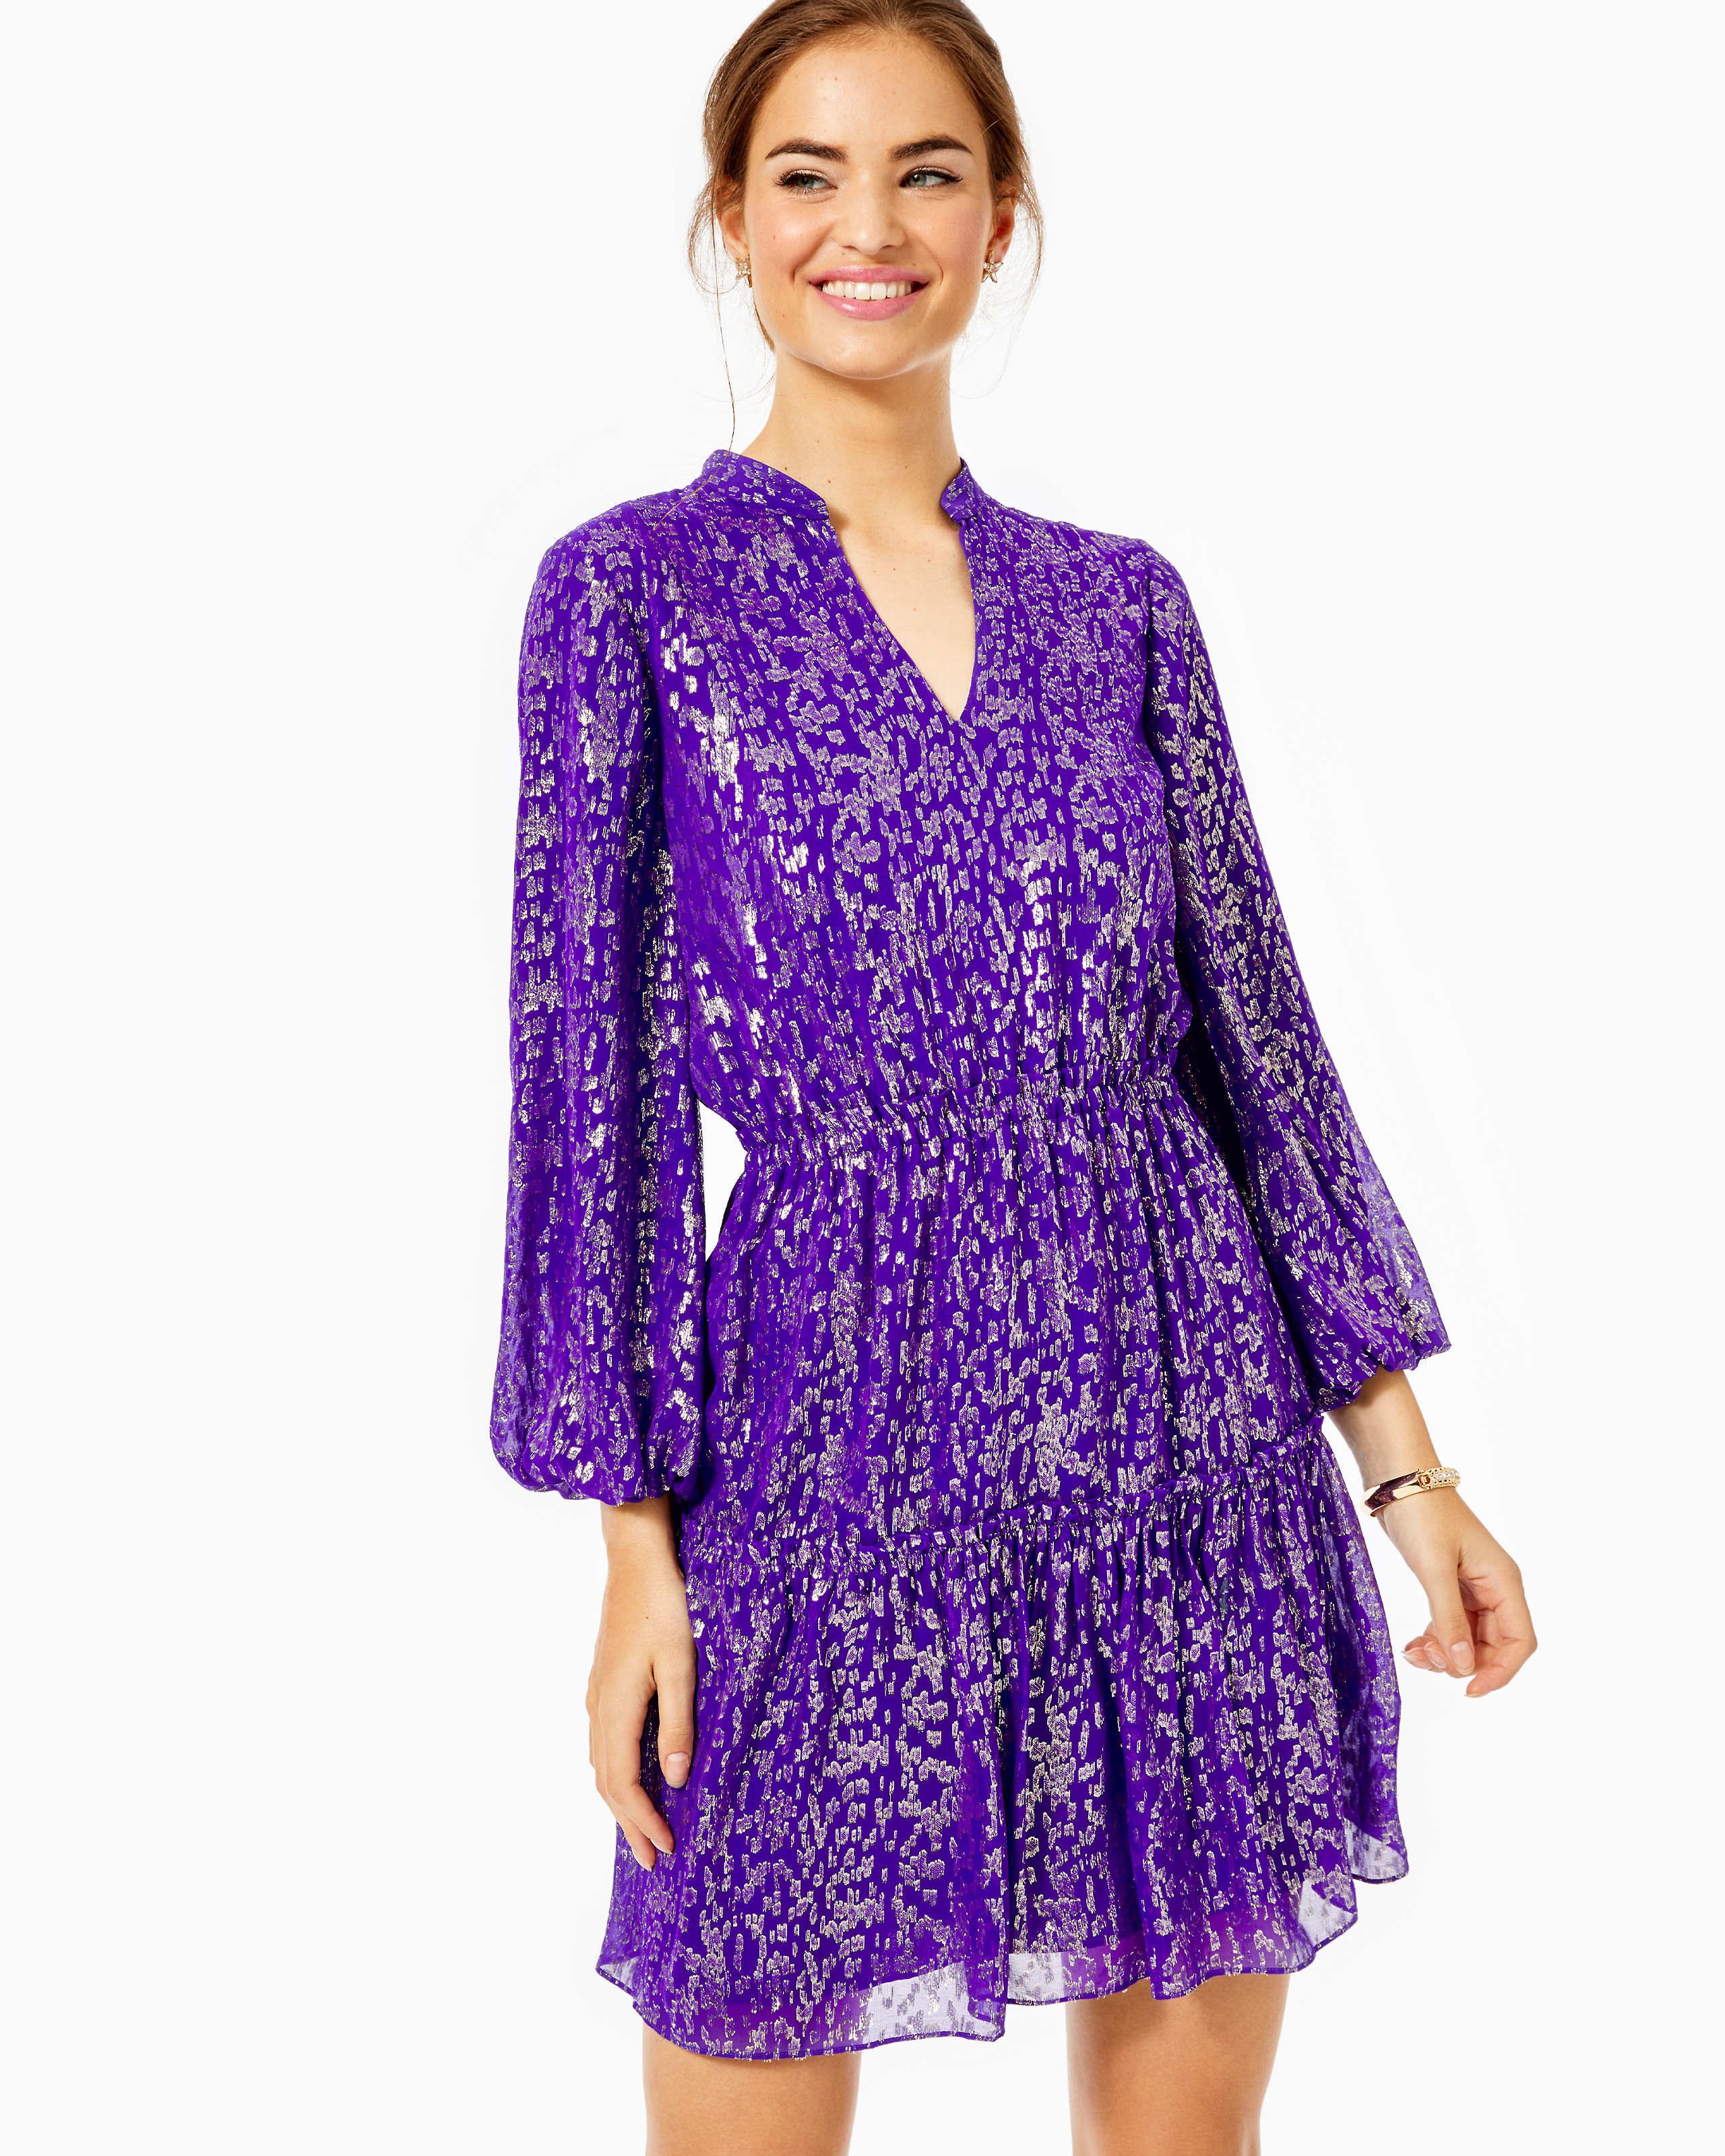 model wearing purple silk dress with long balloon-style sleeves